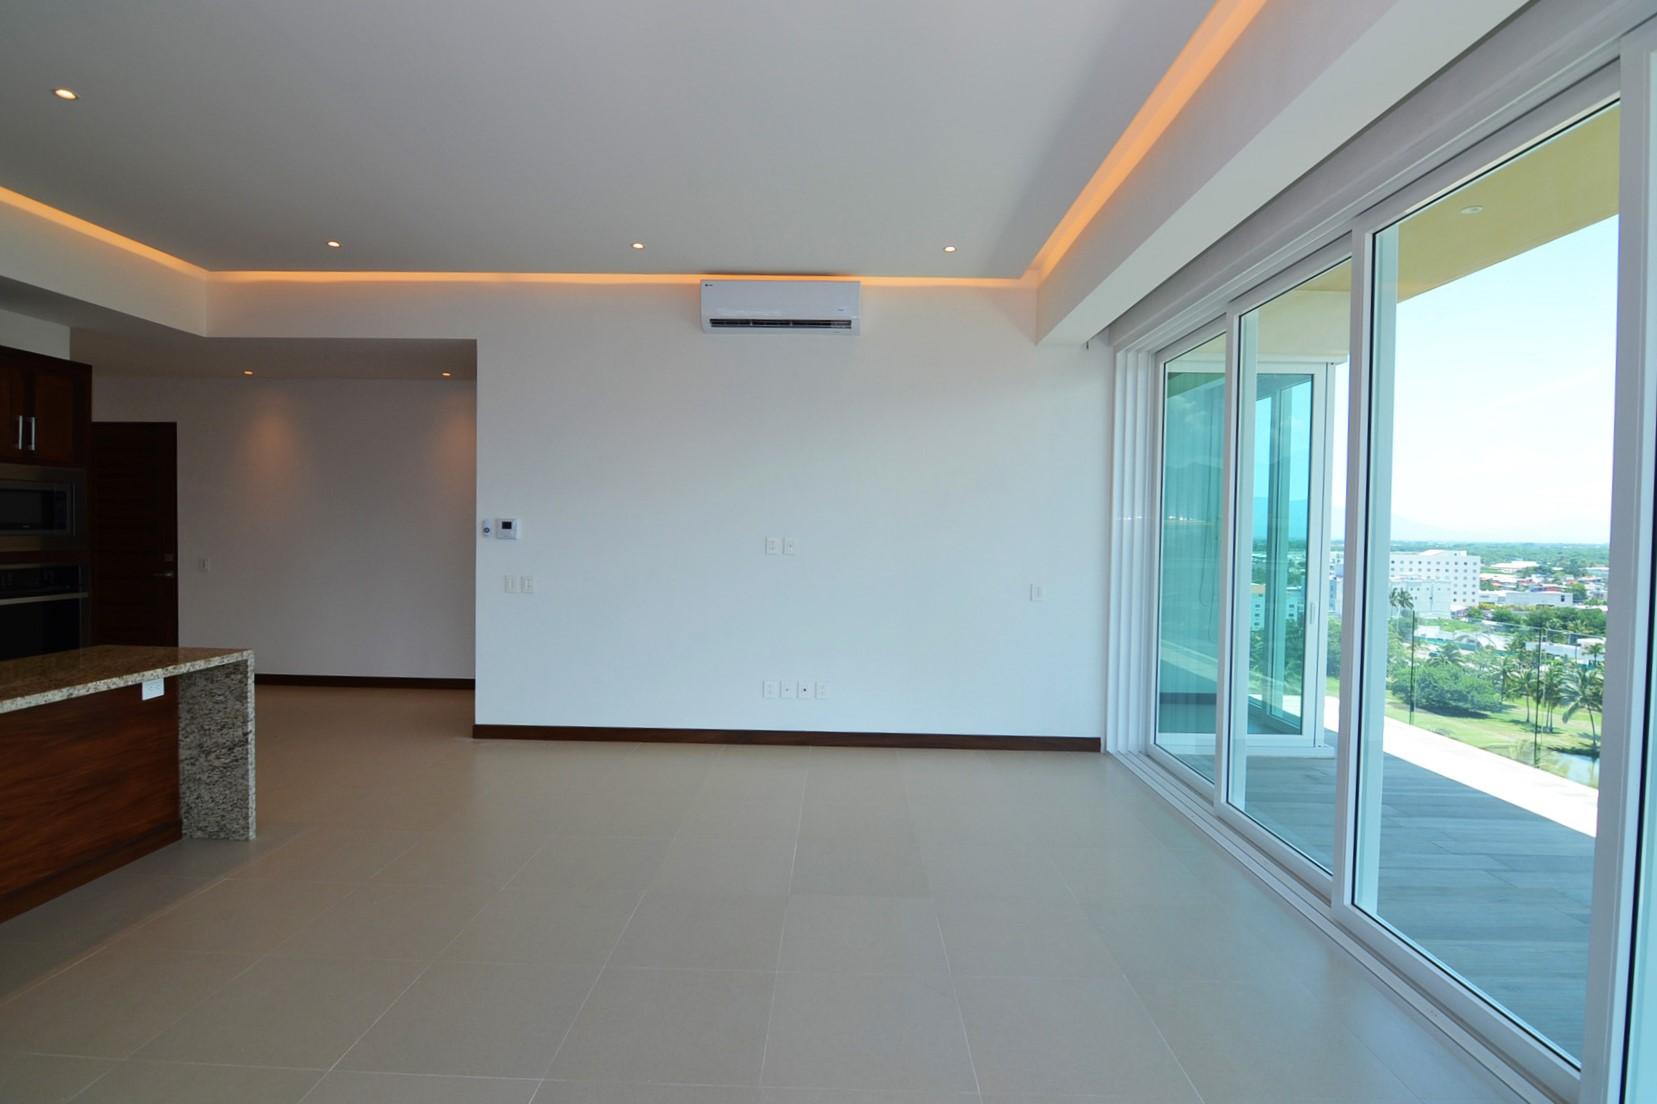 Condo VMarina PH10 - Puerto Vallarta Luxury Condo For Rent (50)